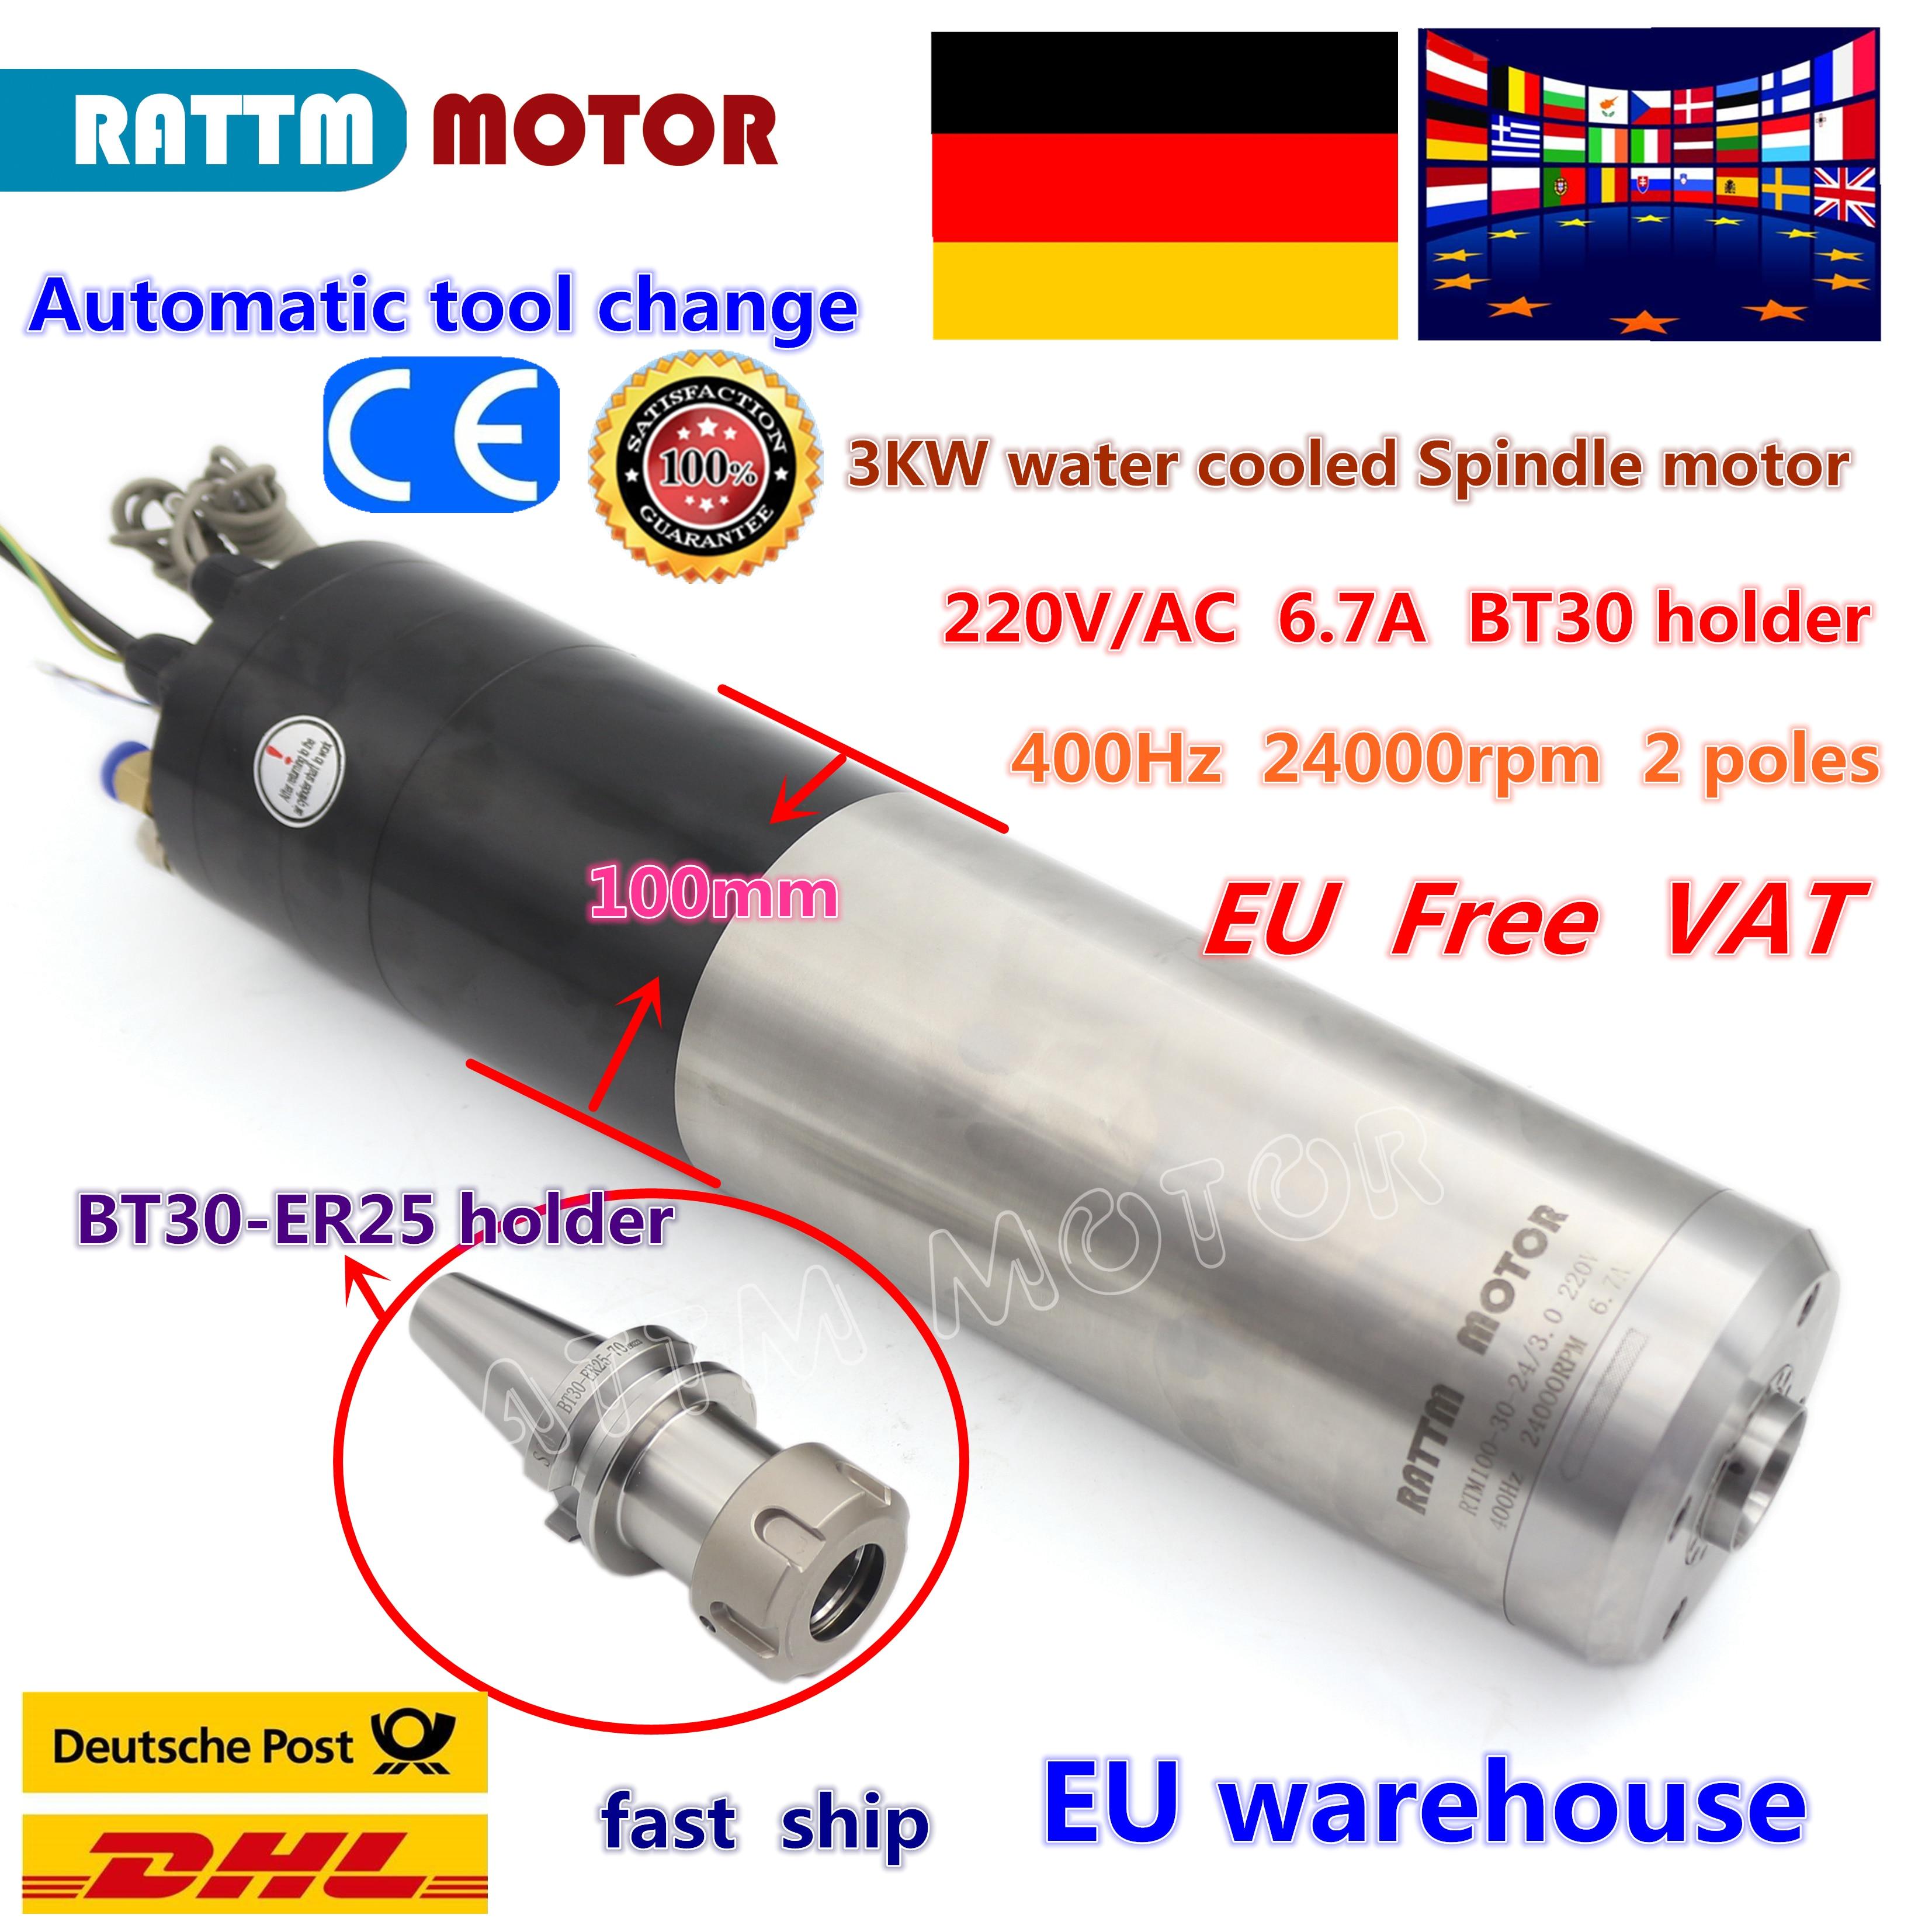 MOTOR DE husillo ATC sin IVA 3KW BT30 cambio automático DE herramienta 24000rpm 220 V/380 V motor DE husillo para máquina de grabado de enrutador CNC